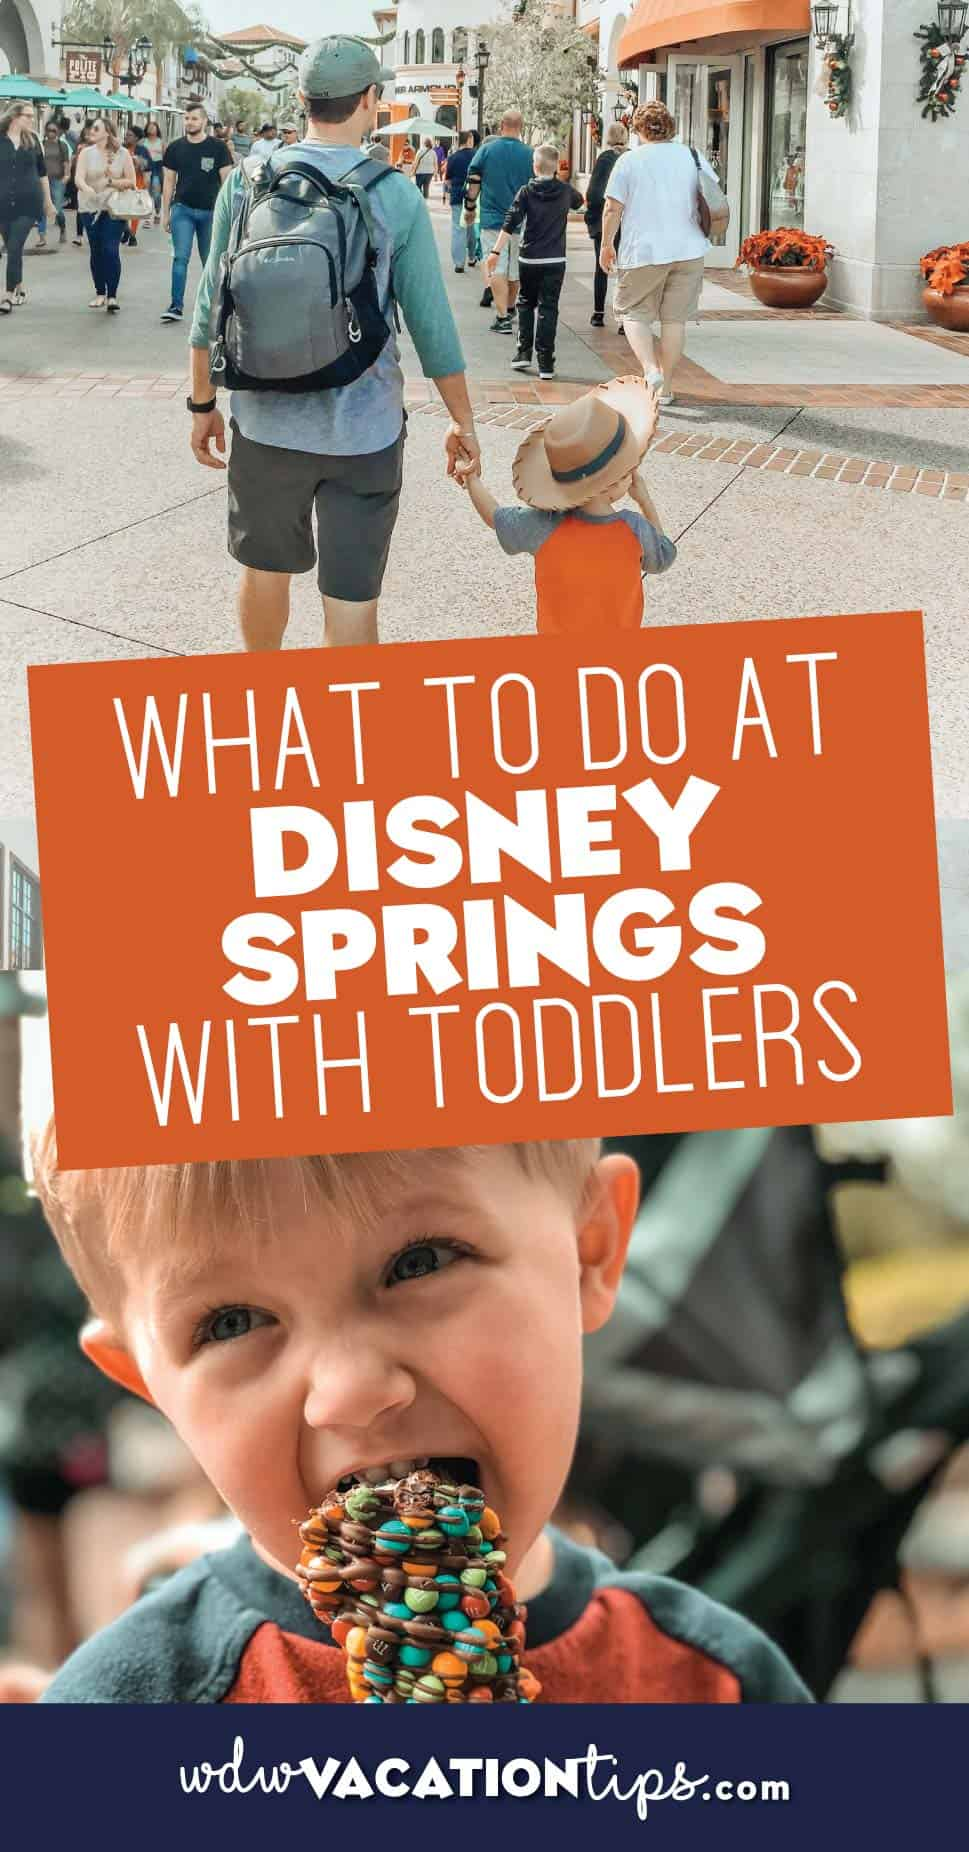 Toddlers at Disney Springs